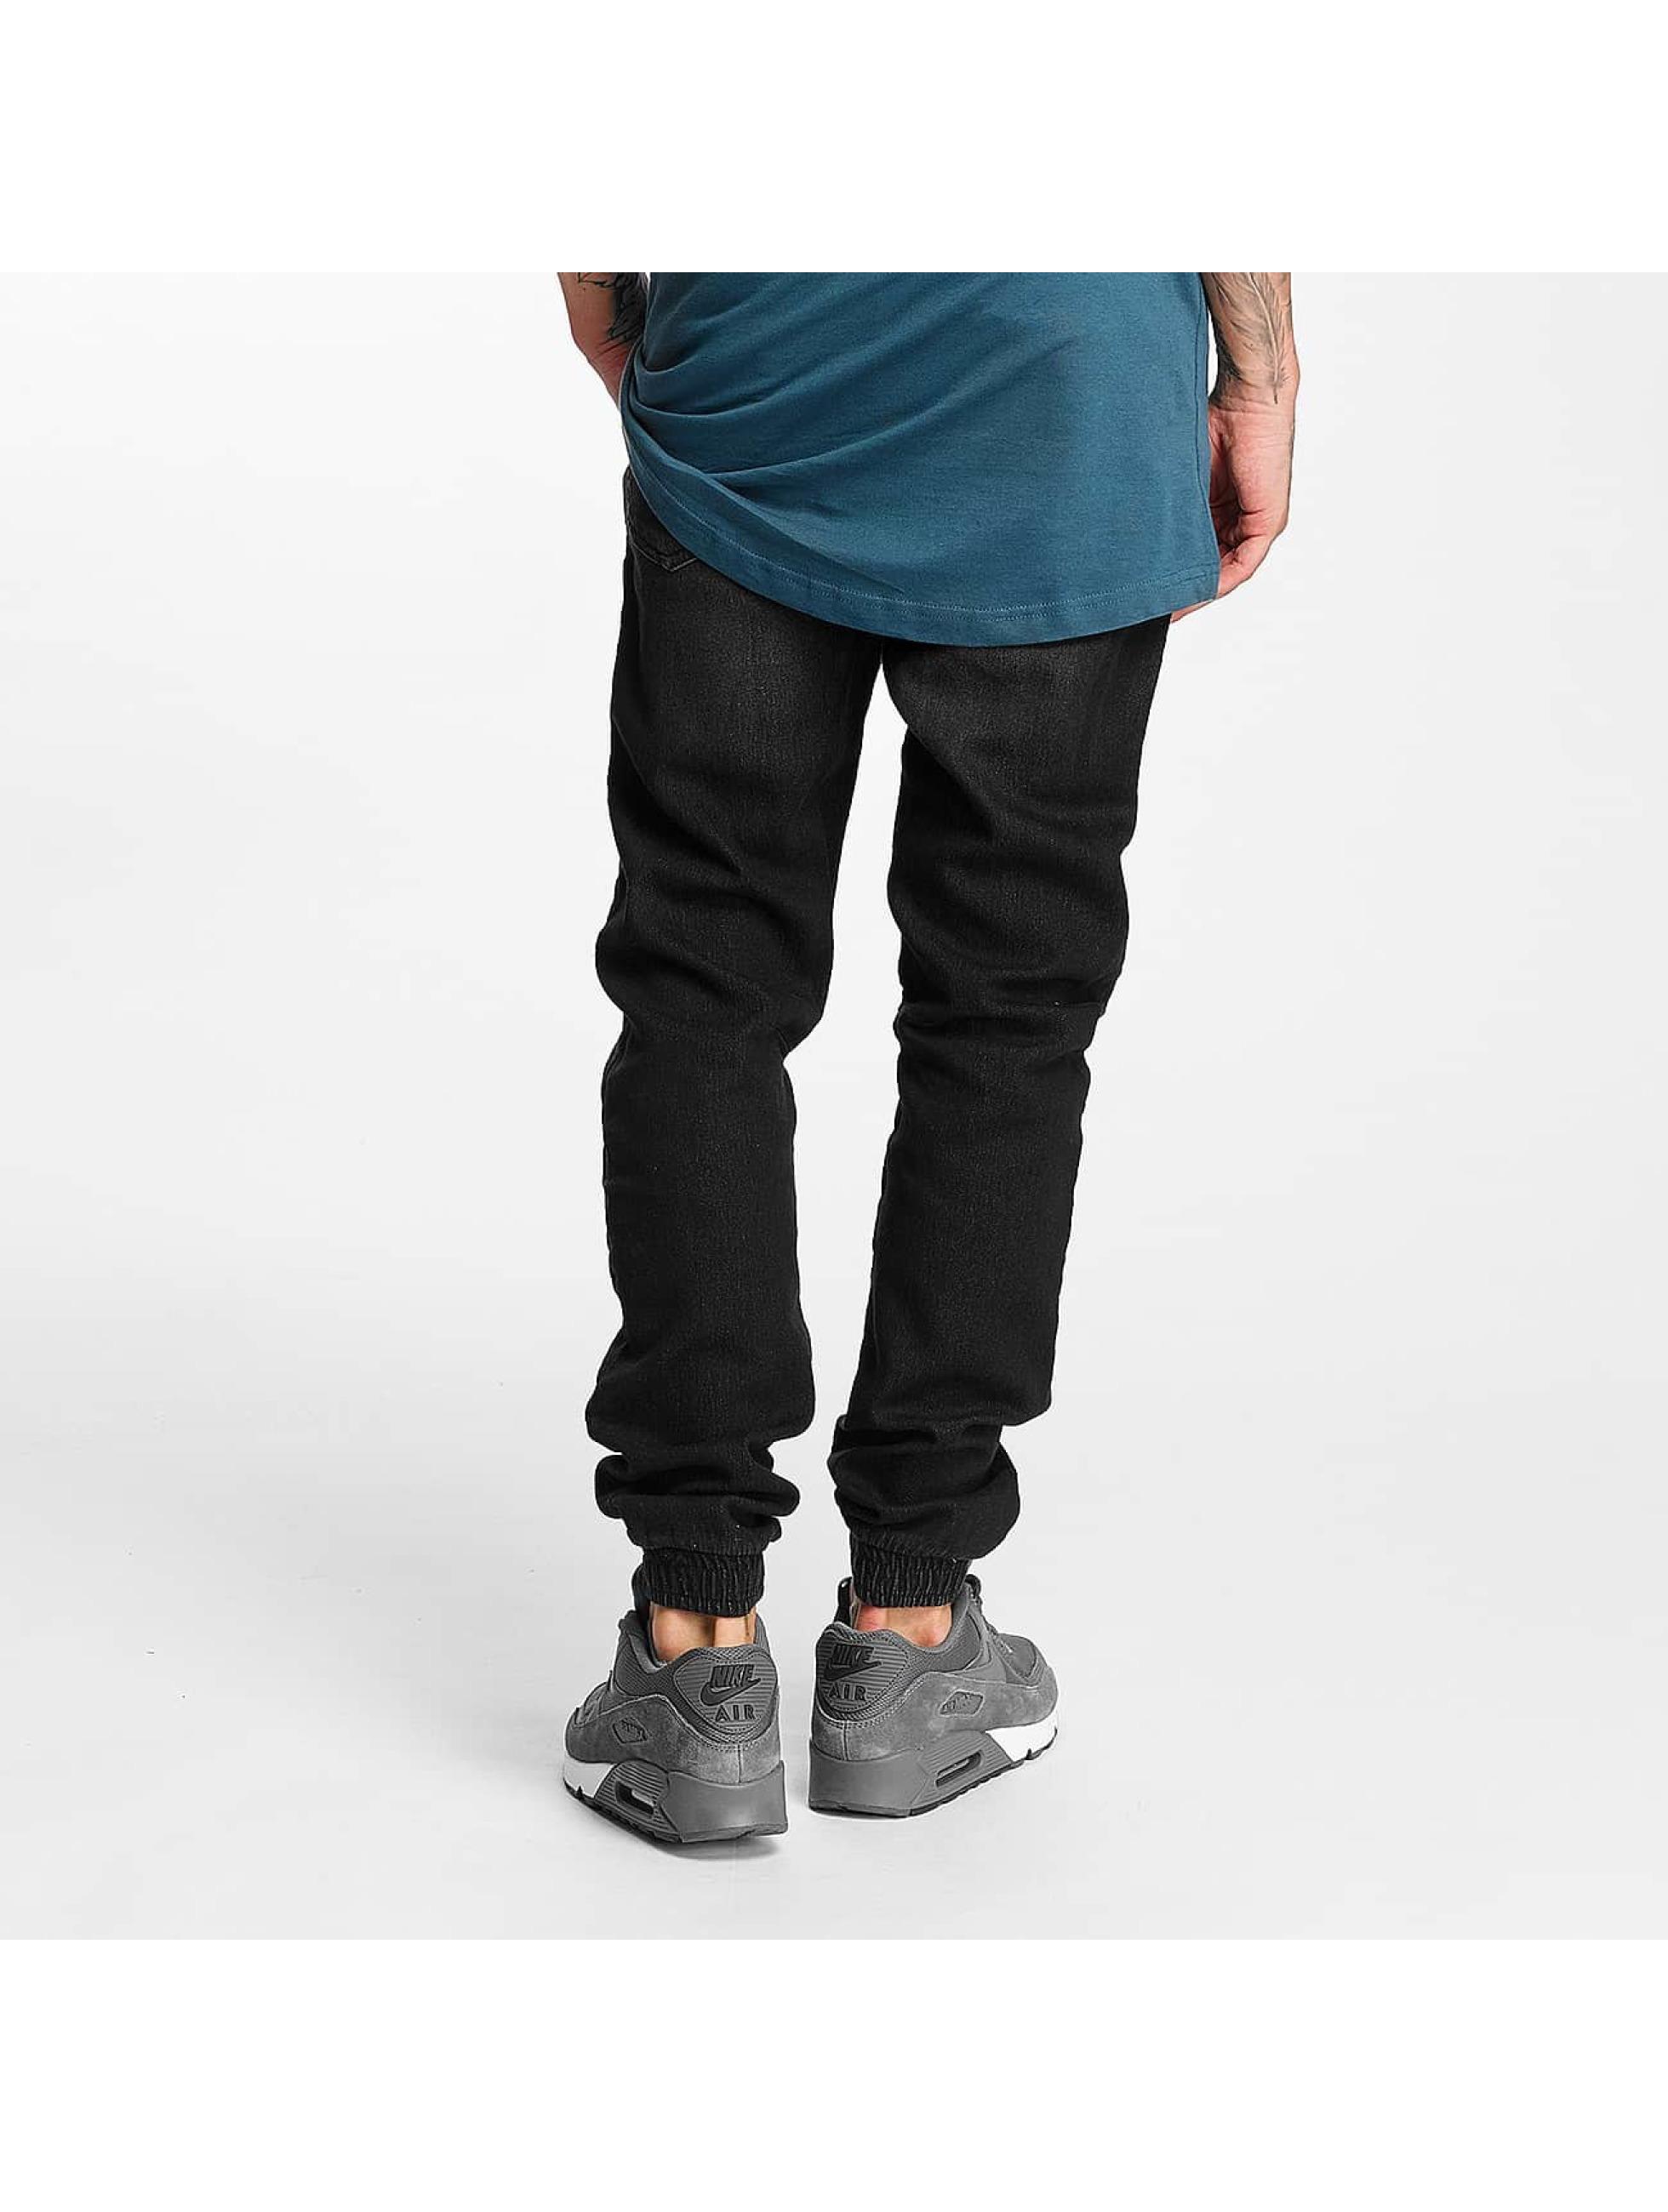 Urban Classics Jogginghose Knitted Denim schwarz